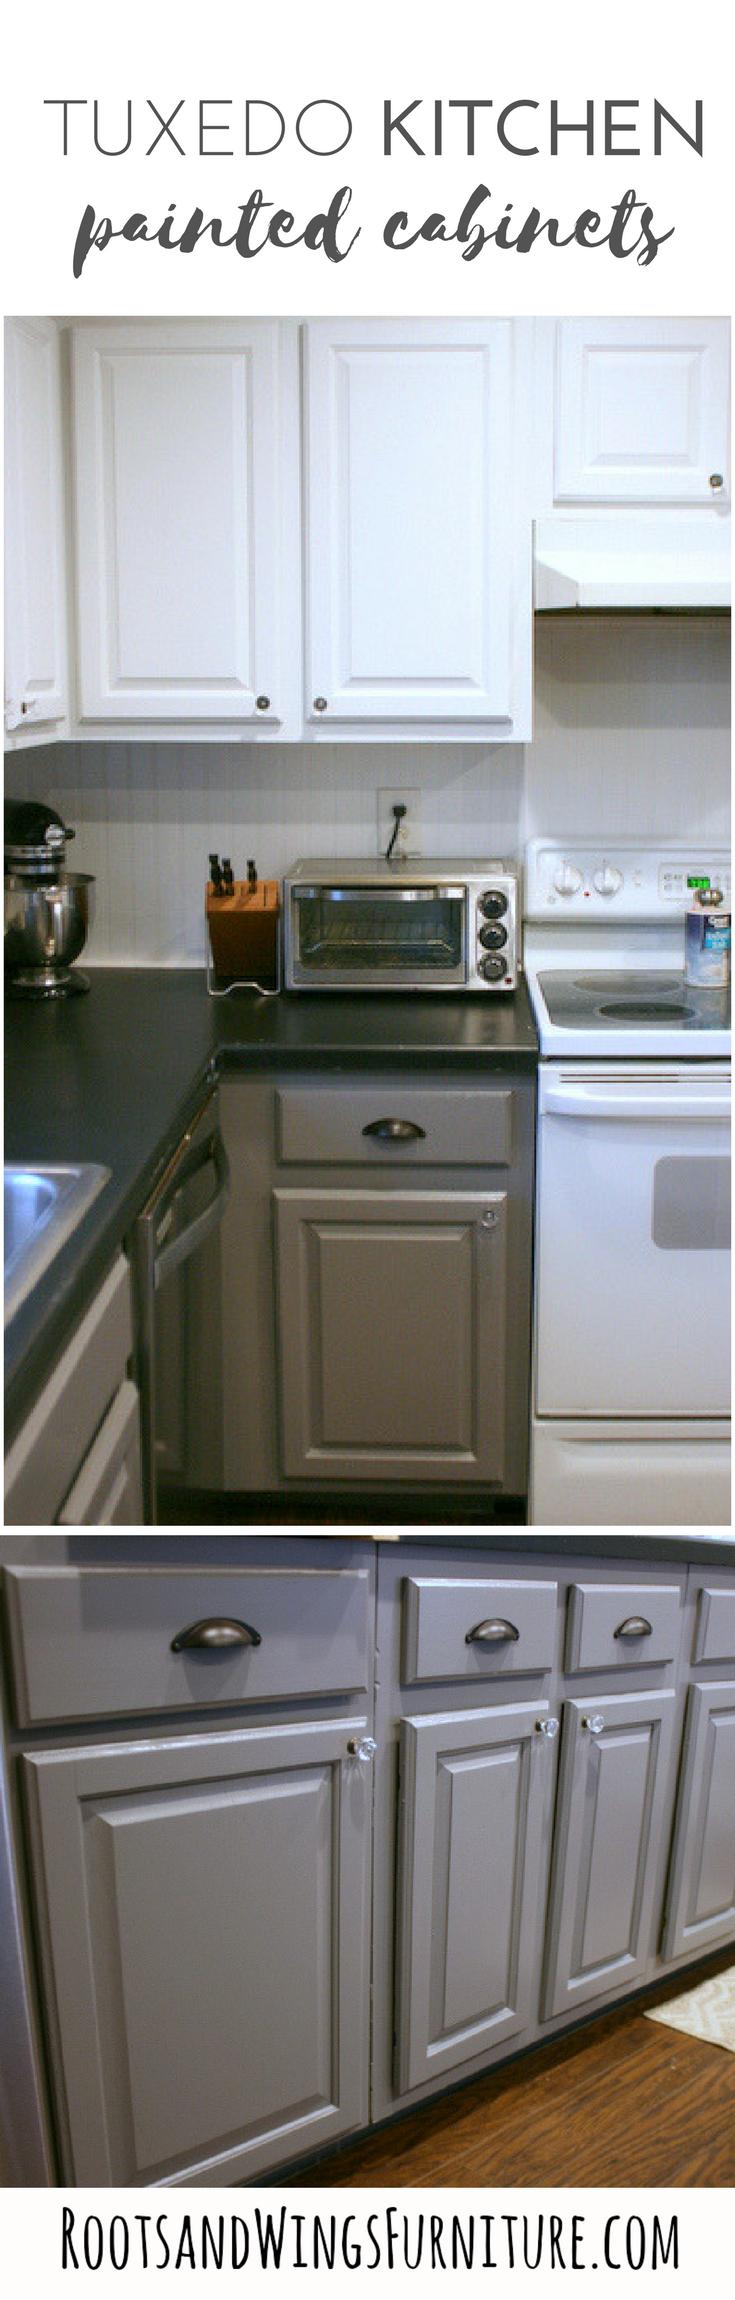 Tuxedo Kitchen Cabinet Makeover Kitchen Cabinets Makeover Finish Kitchen Cabinets Driftwood Kitchen